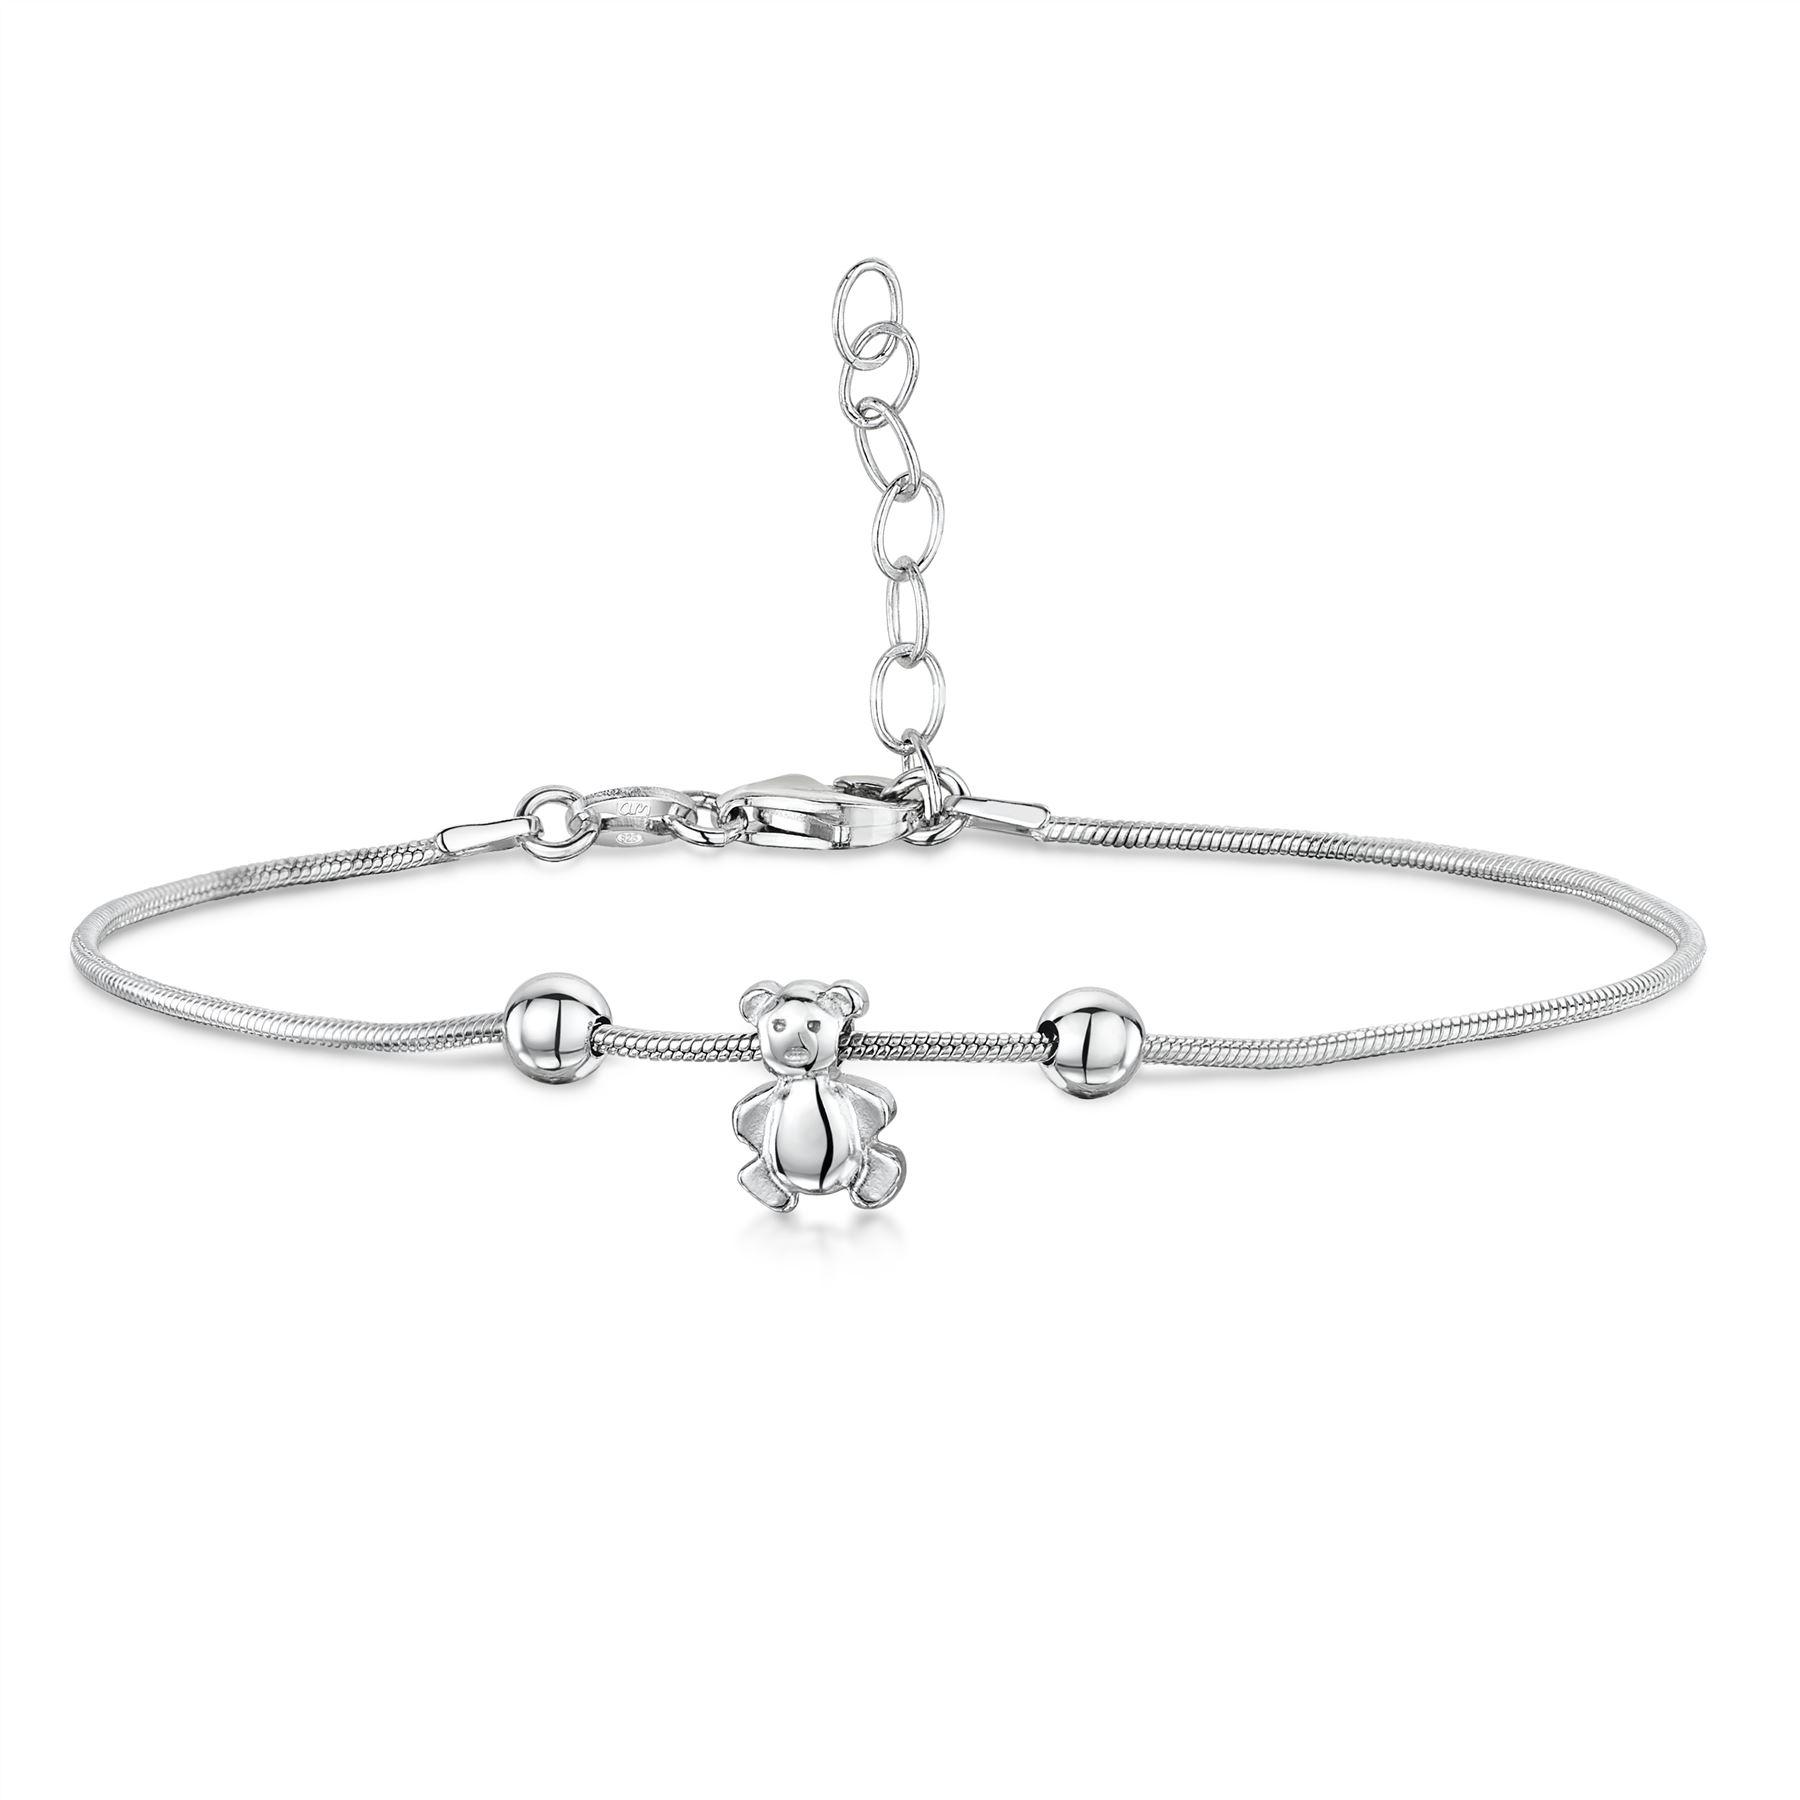 Amberta-Jewelry-925-Sterling-Silver-Adjustable-Bracelet-Italian-Bangle-for-Women thumbnail 18